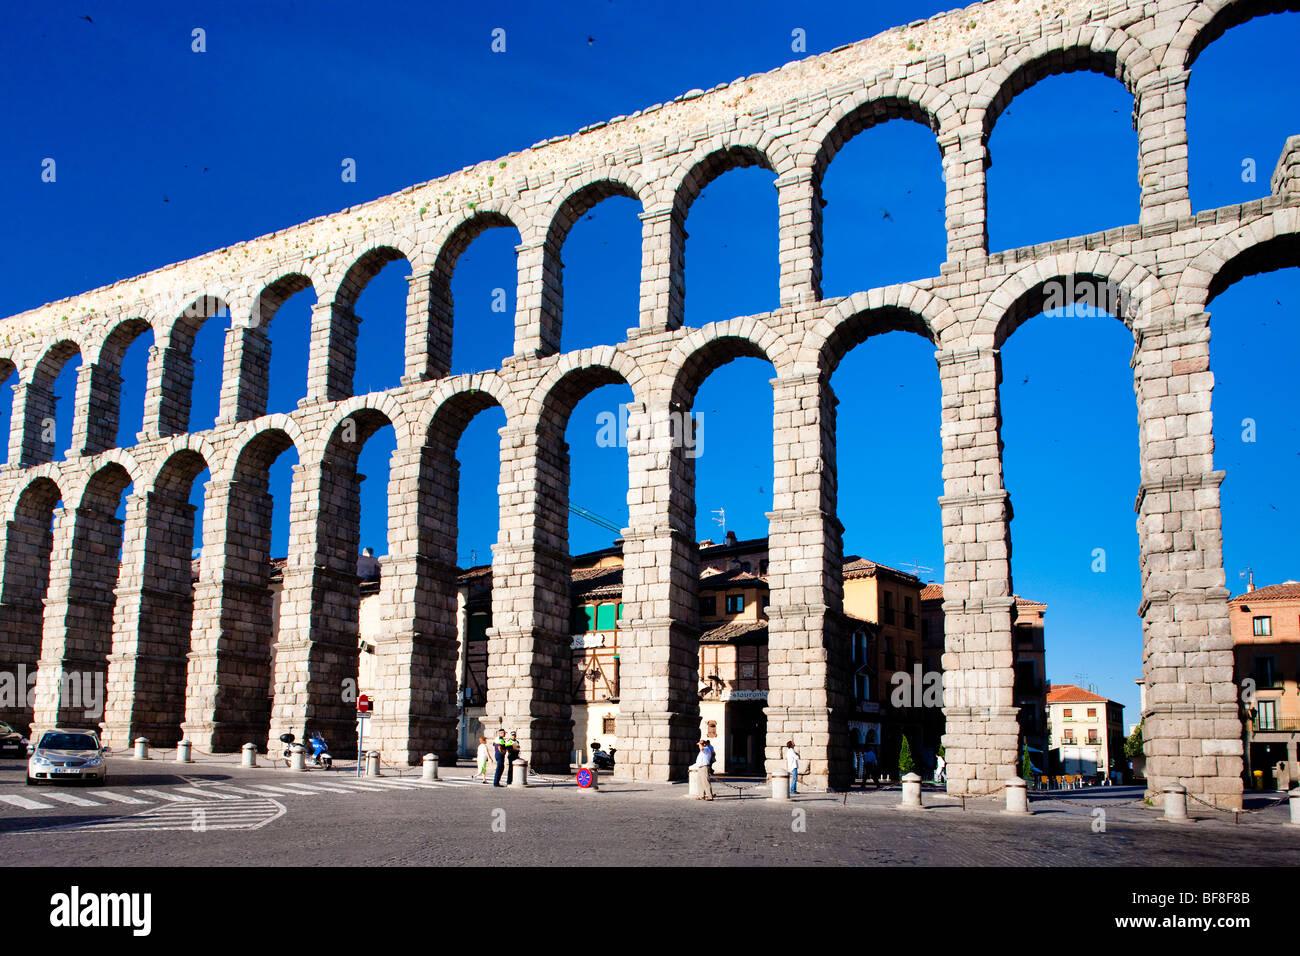 Roman aqueduct, Segovia, Castile and Leon, Spain - Stock Image